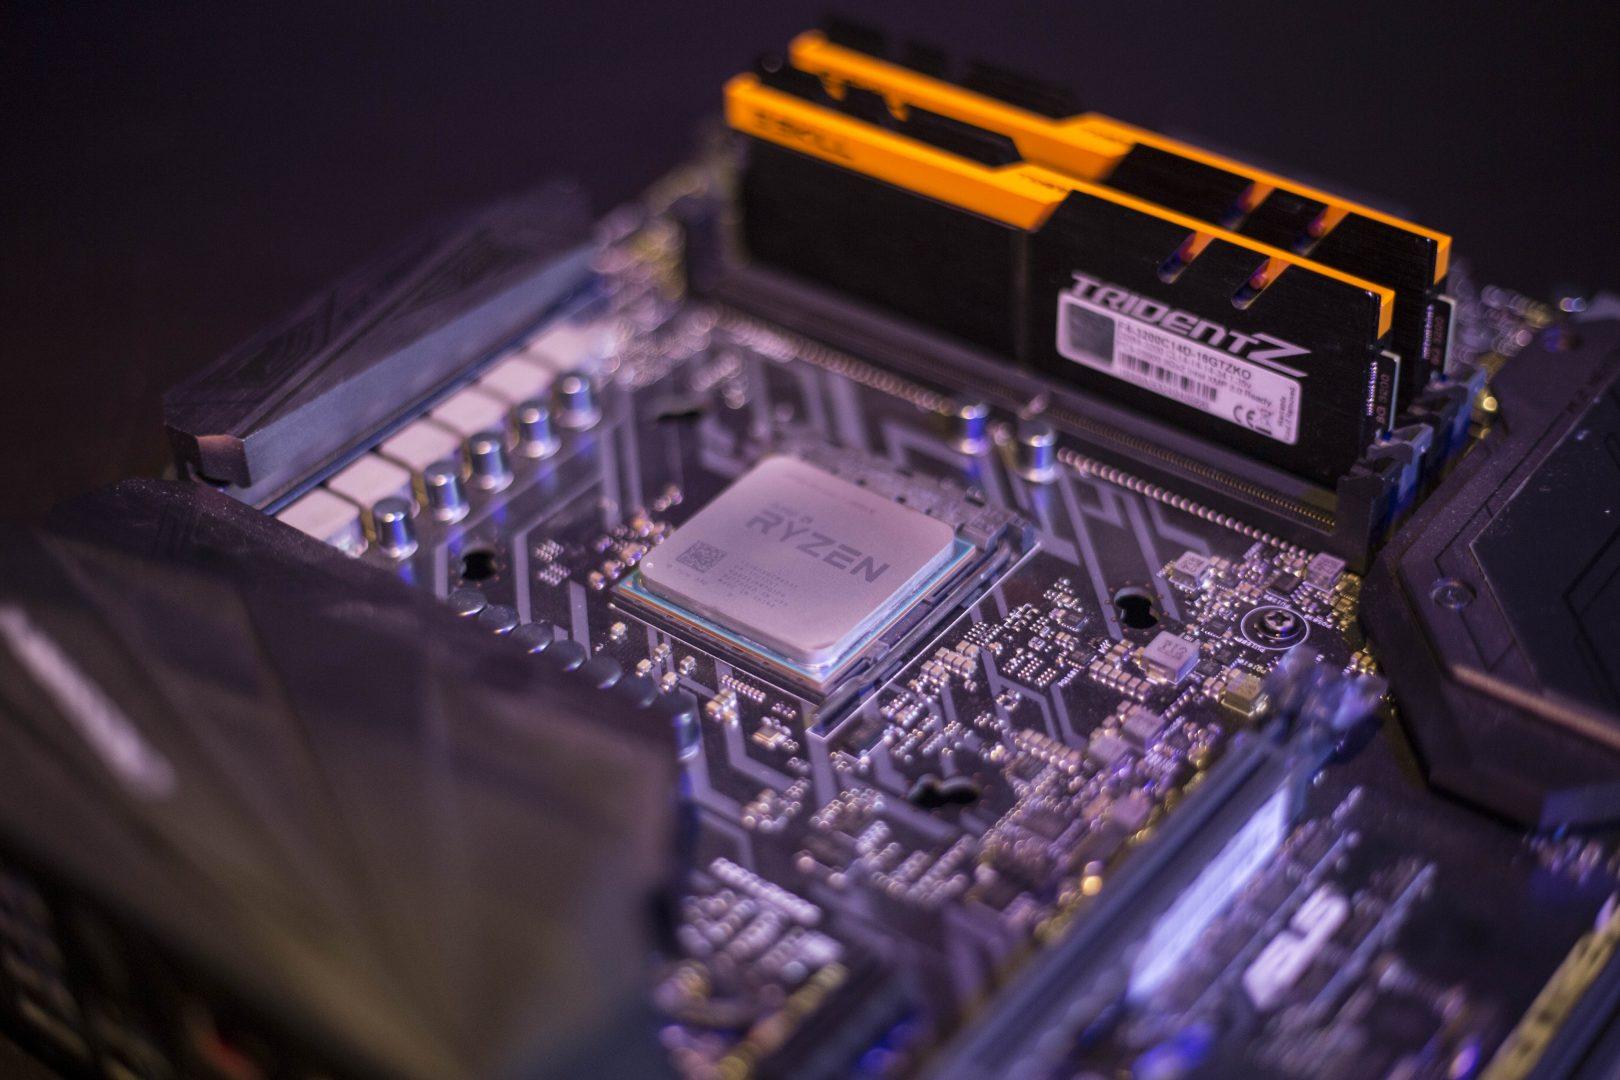 ASUS ROG Crosshair VI Extreme AMD X370